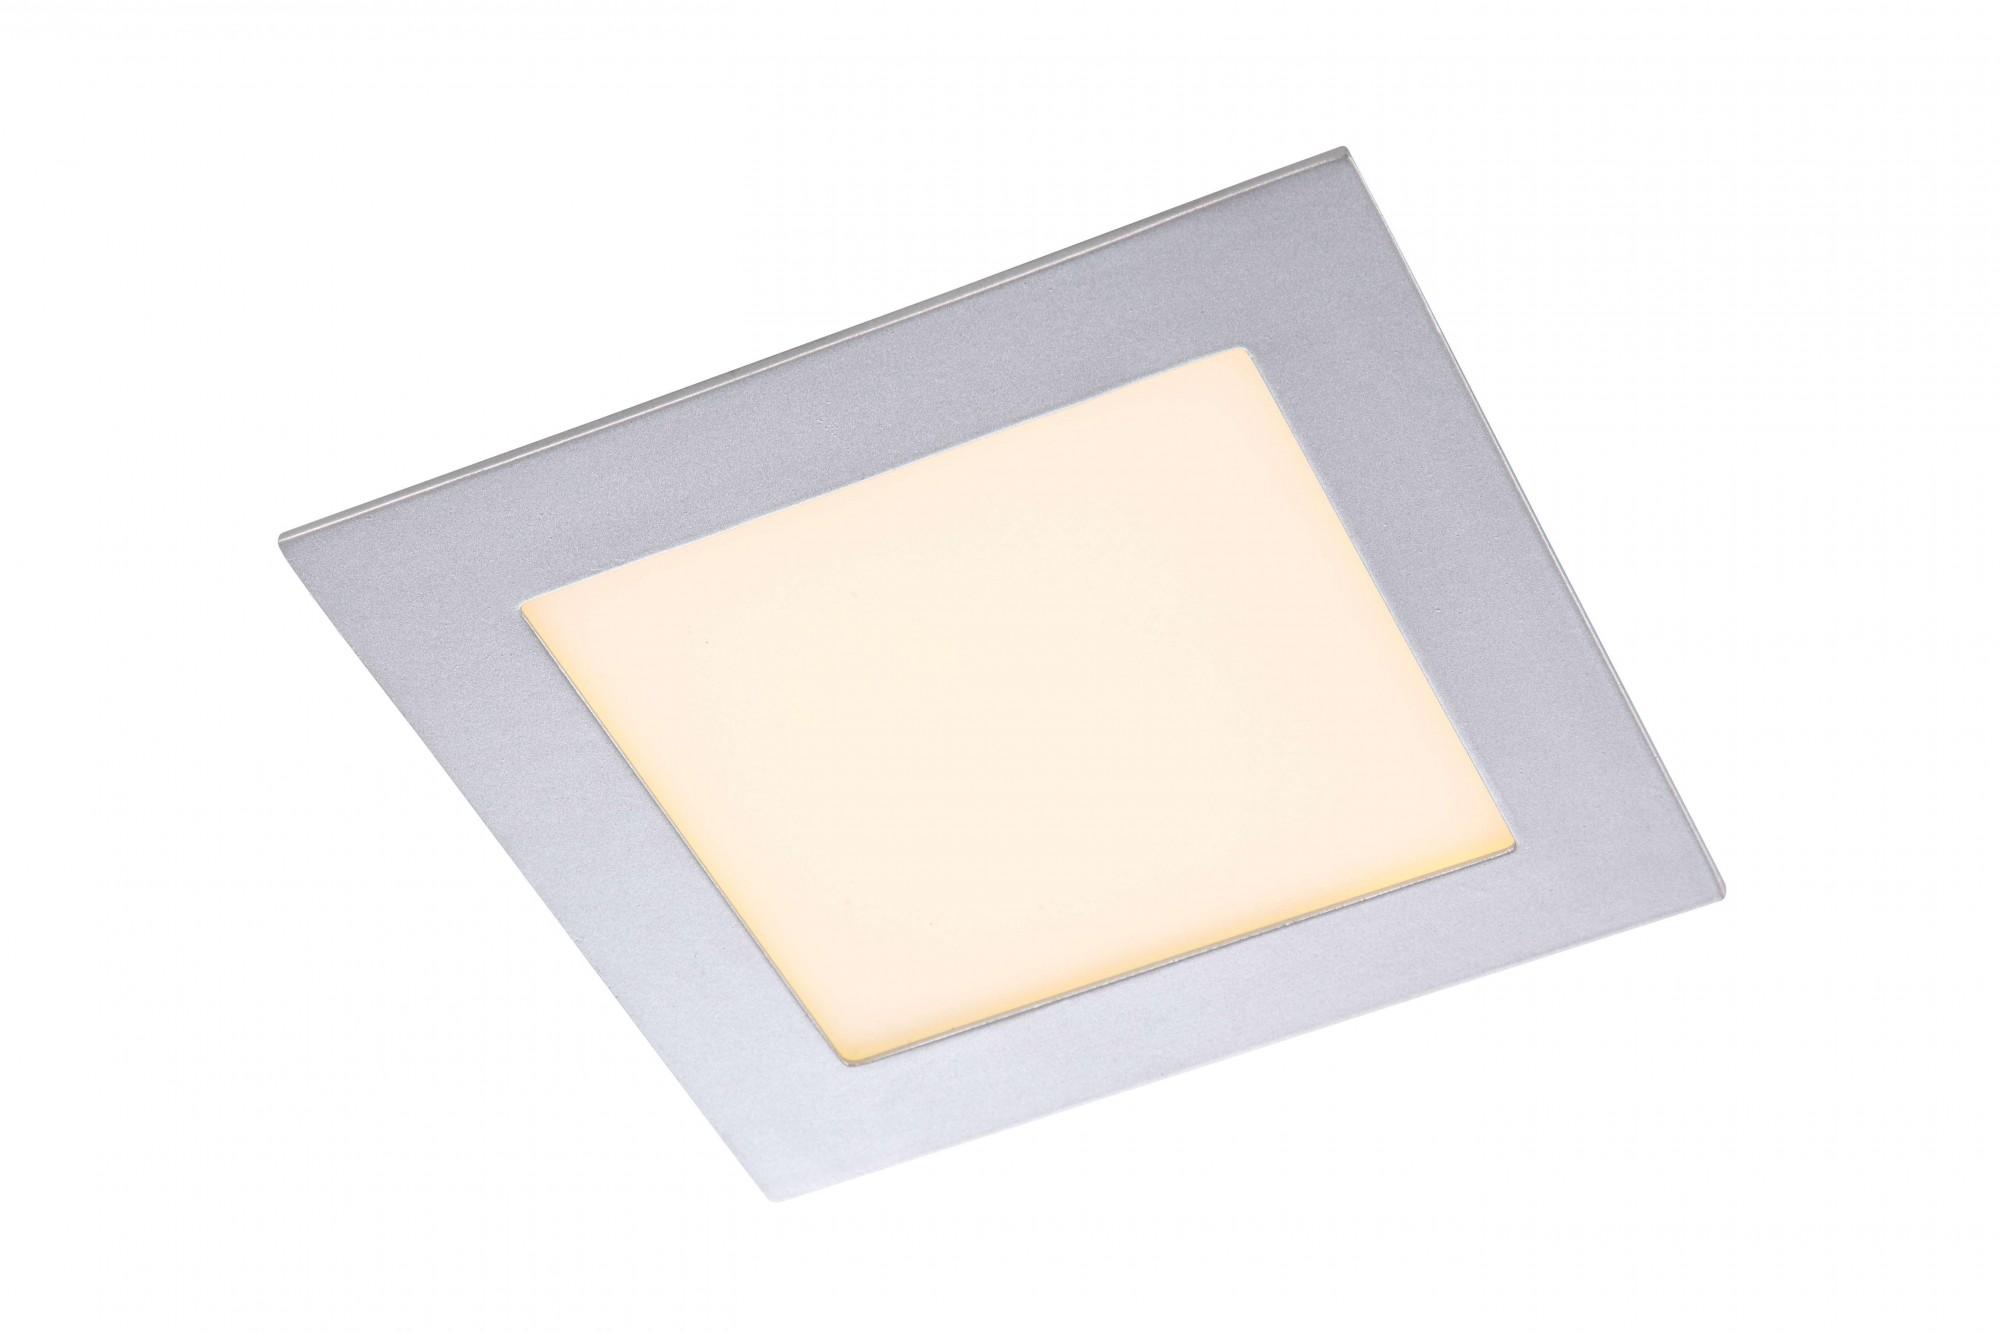 Фото товара A7416PL-1GY Arte Lamp